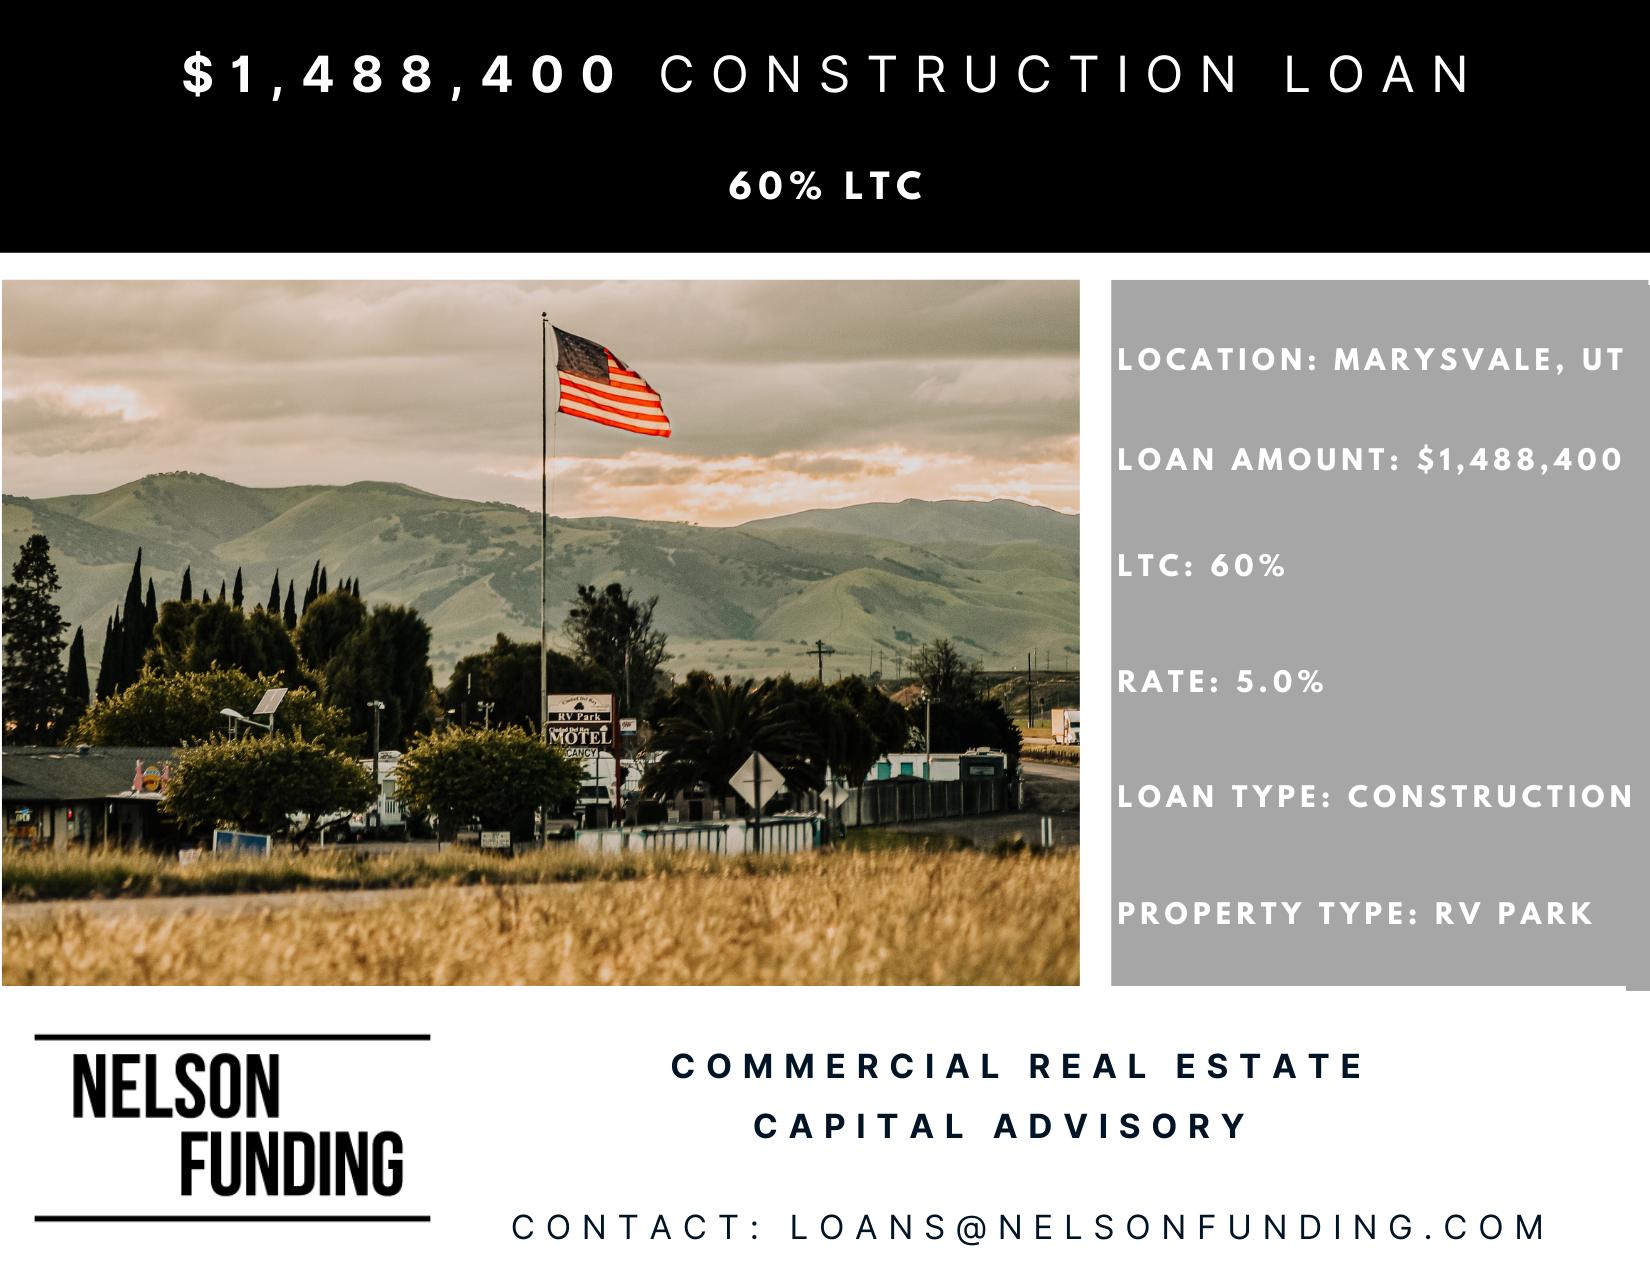 Closes $1,488,400 Construction Loan in Marysvale, UT